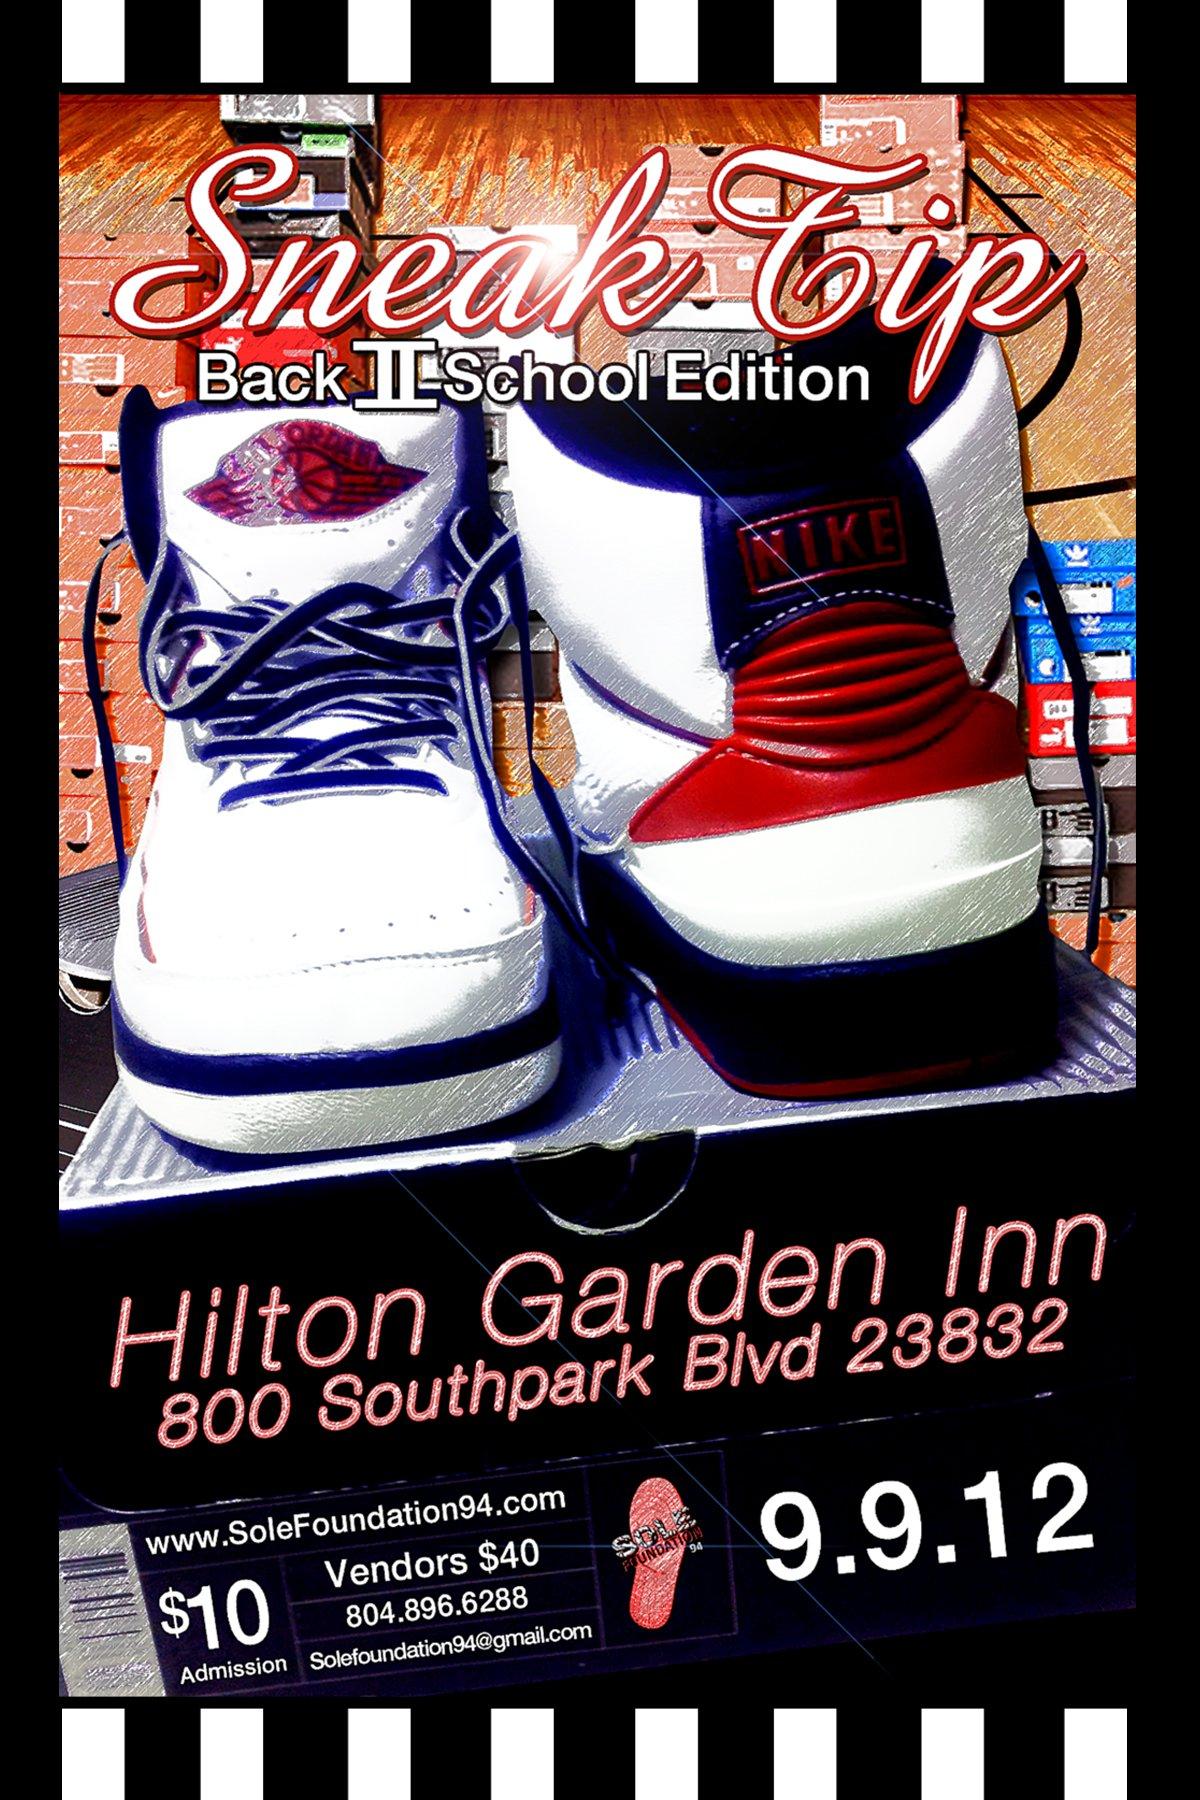 SneakTip Back II School Sneaker Convention